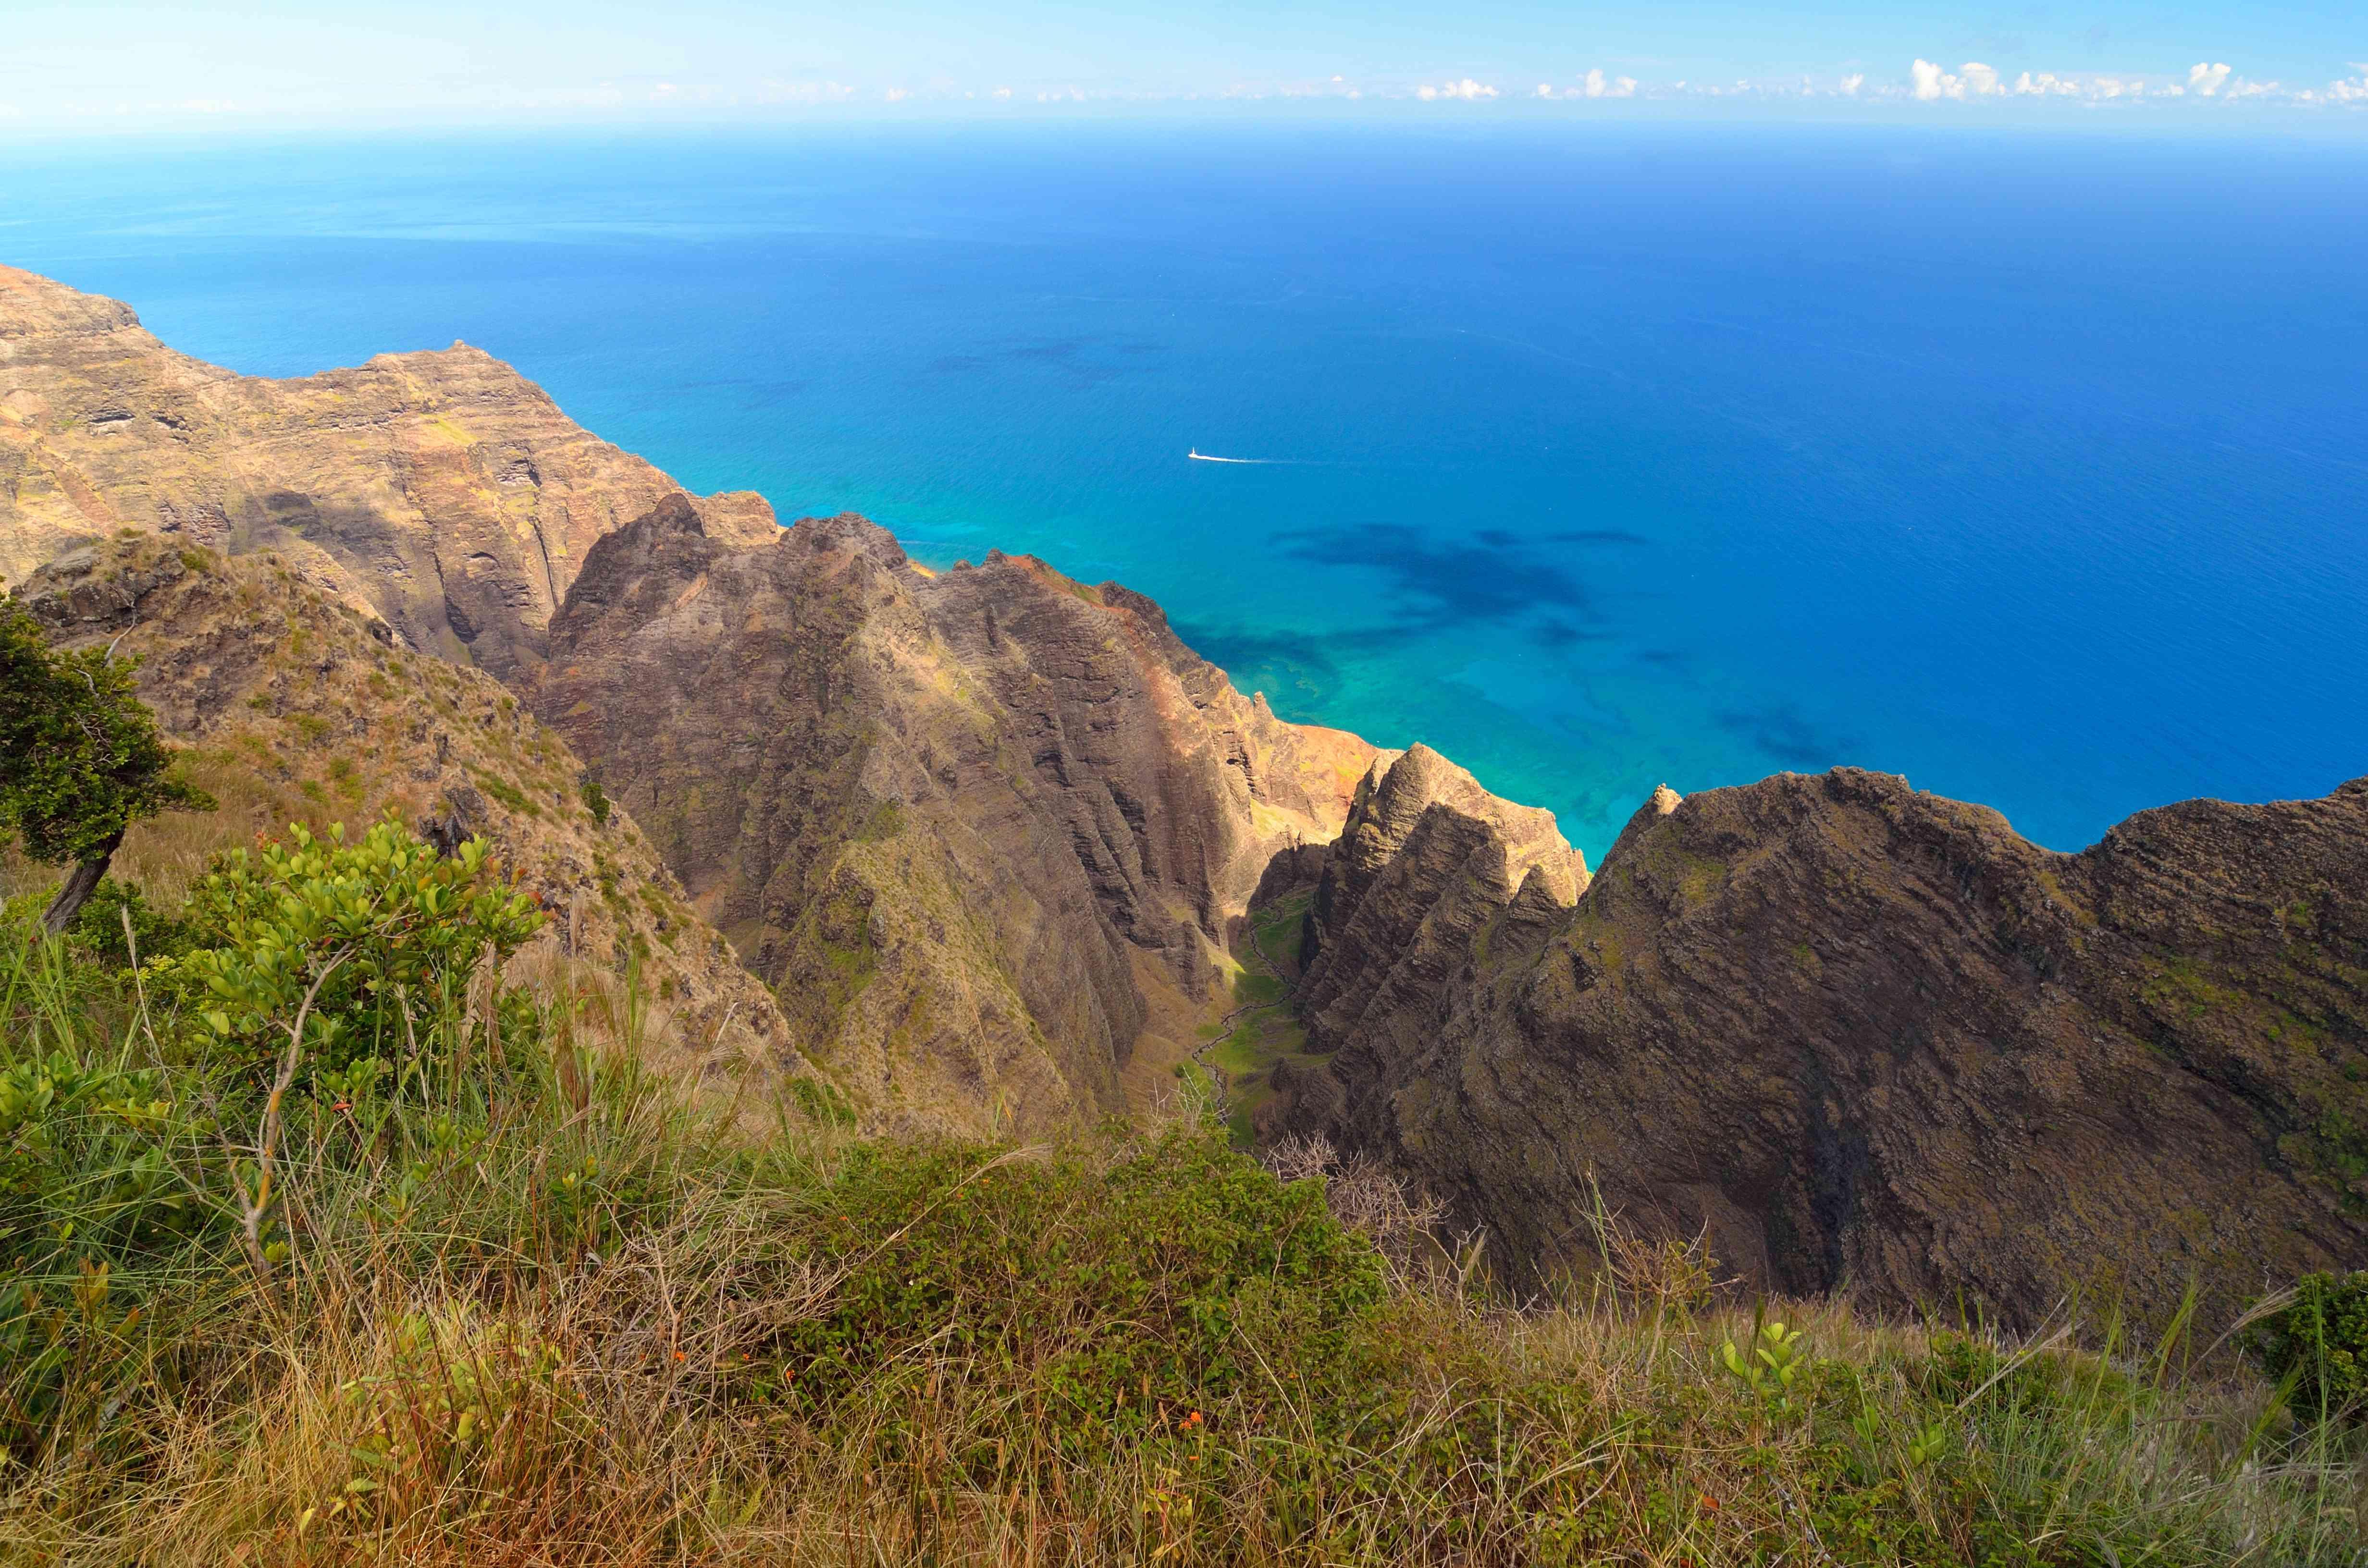 Napali coast from Awa'awapuhi Trail, Kauai, Hawaii